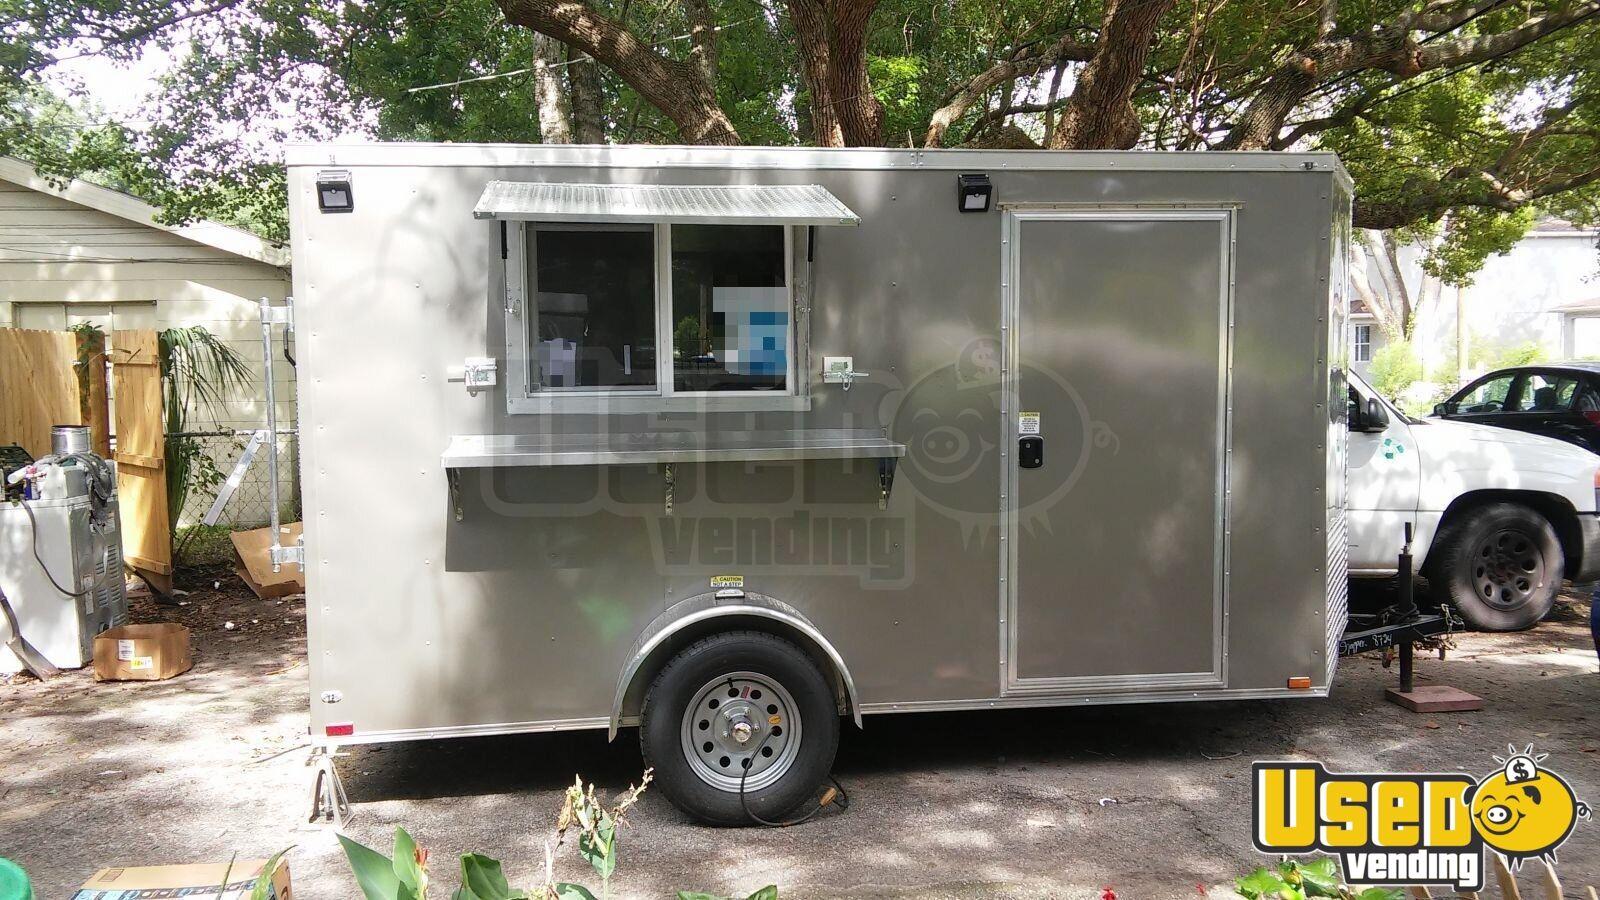 2018 6 x 12 food concession trailer for sale in north carolina